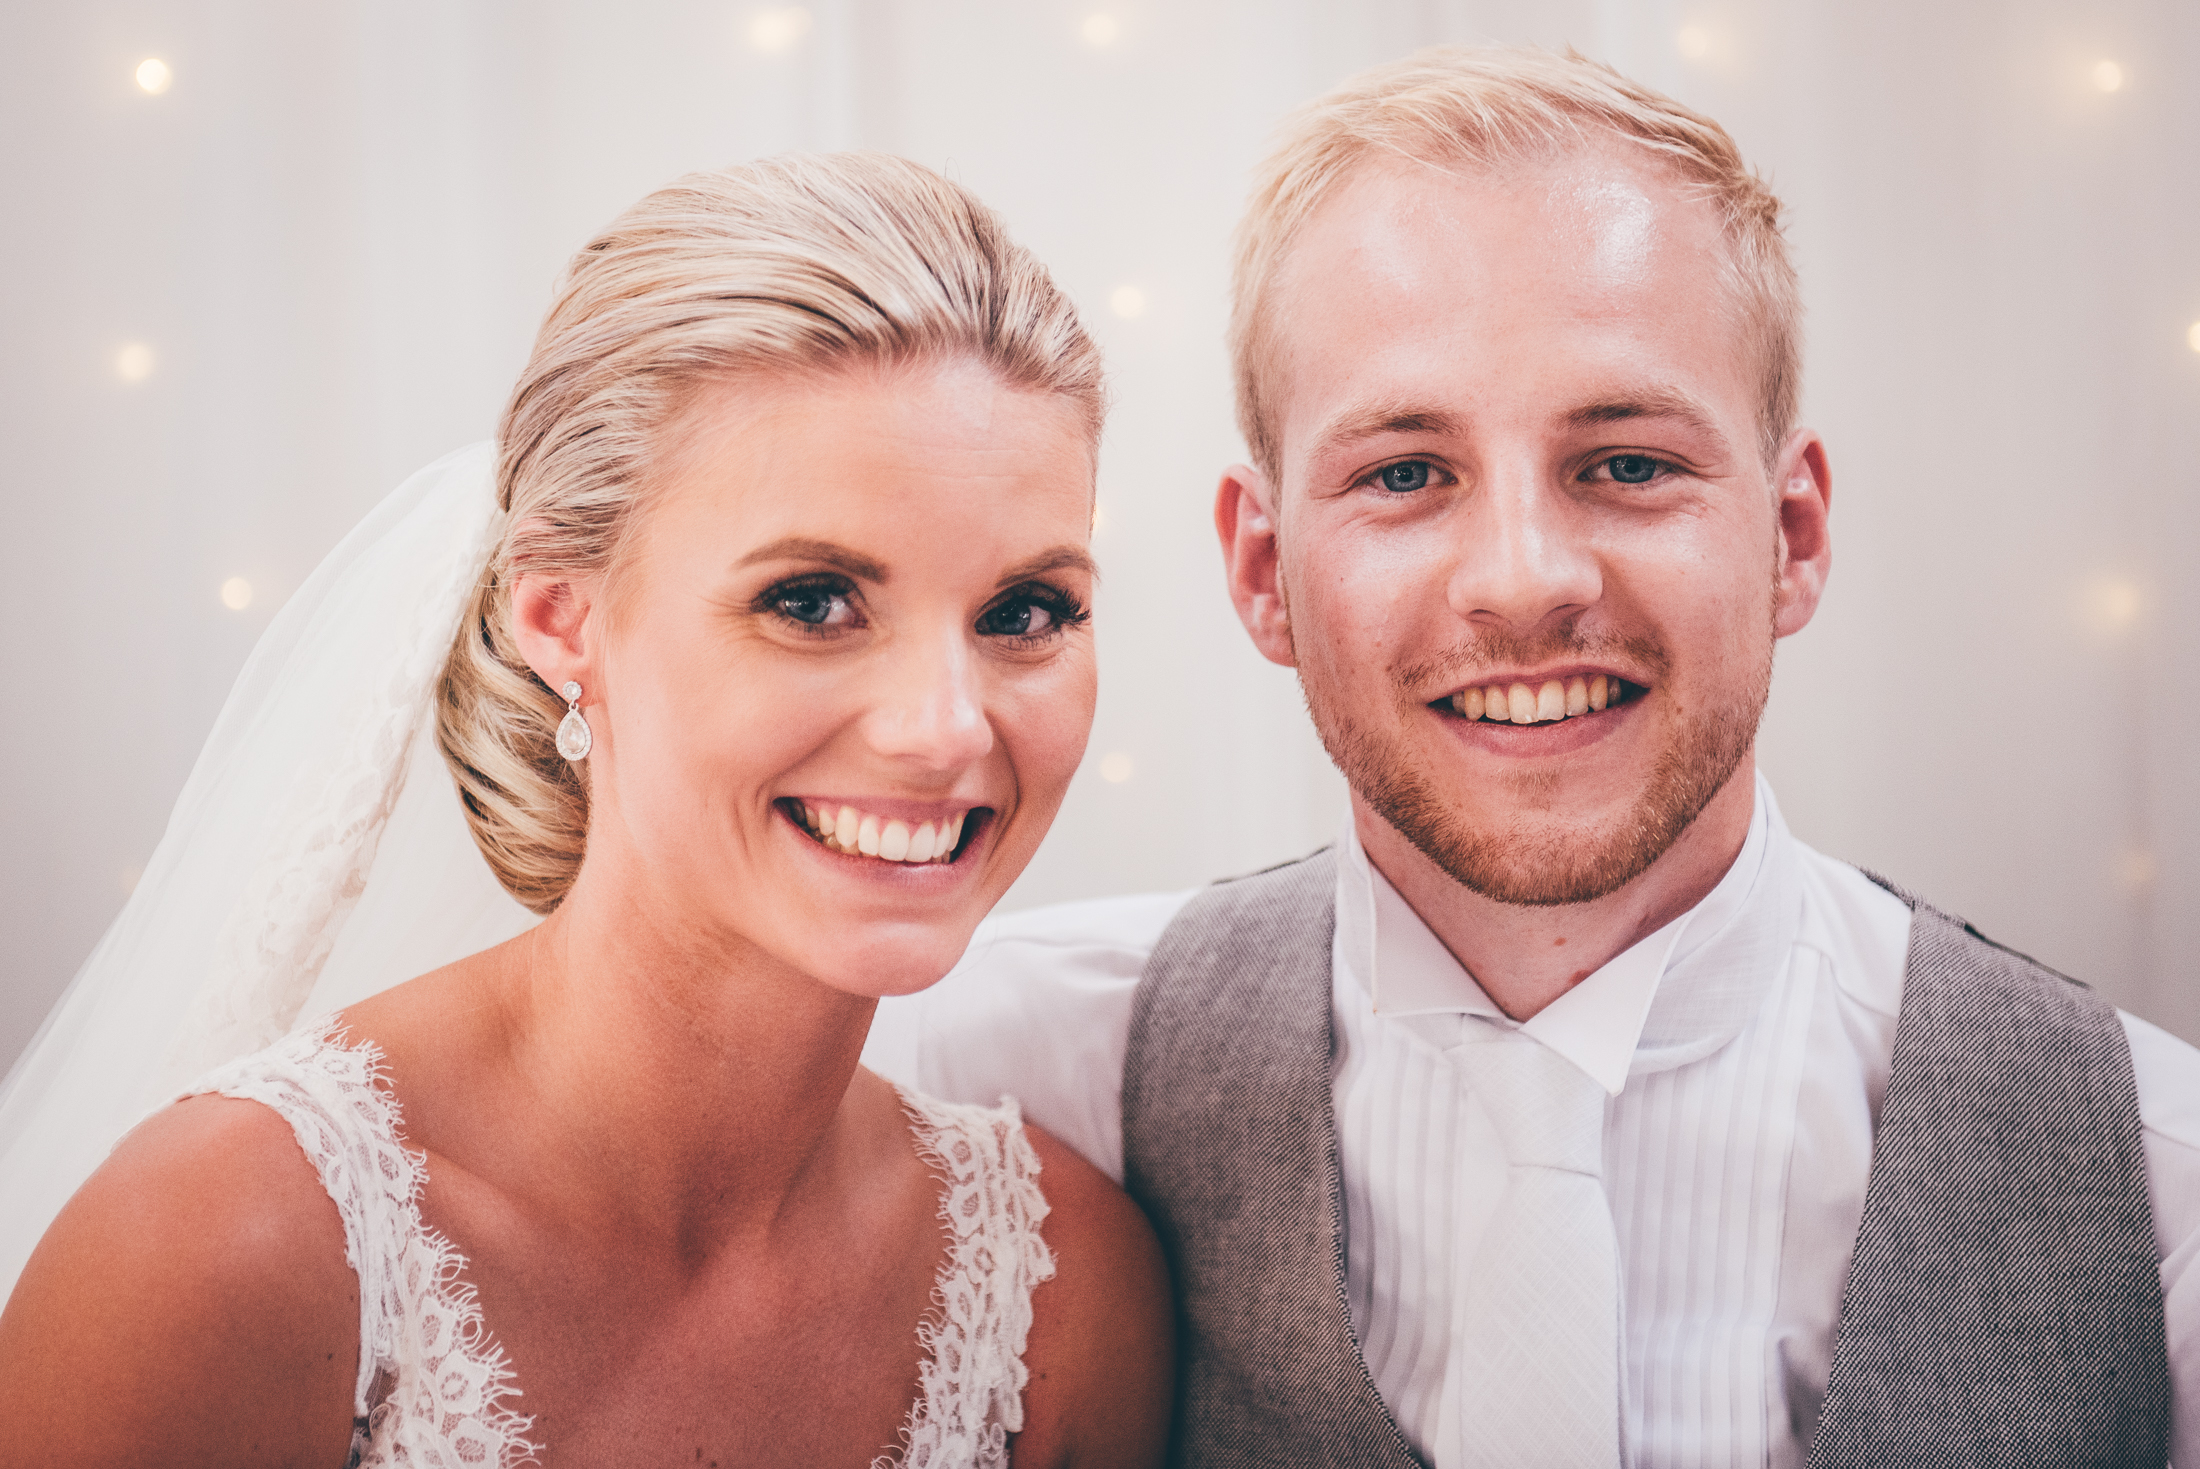 bröllop_linda_robin26.jpg